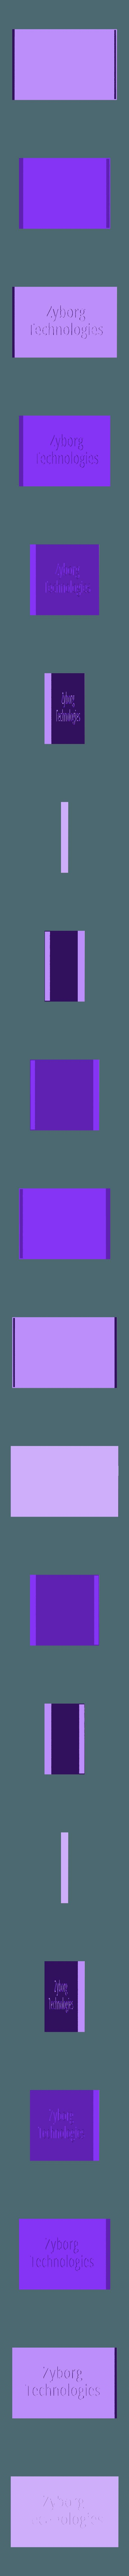 Nexus_Ops_-_Green_Lid.stl Download free STL file Nexus Ops Insert Cases • 3D printing object, Hardcore3D